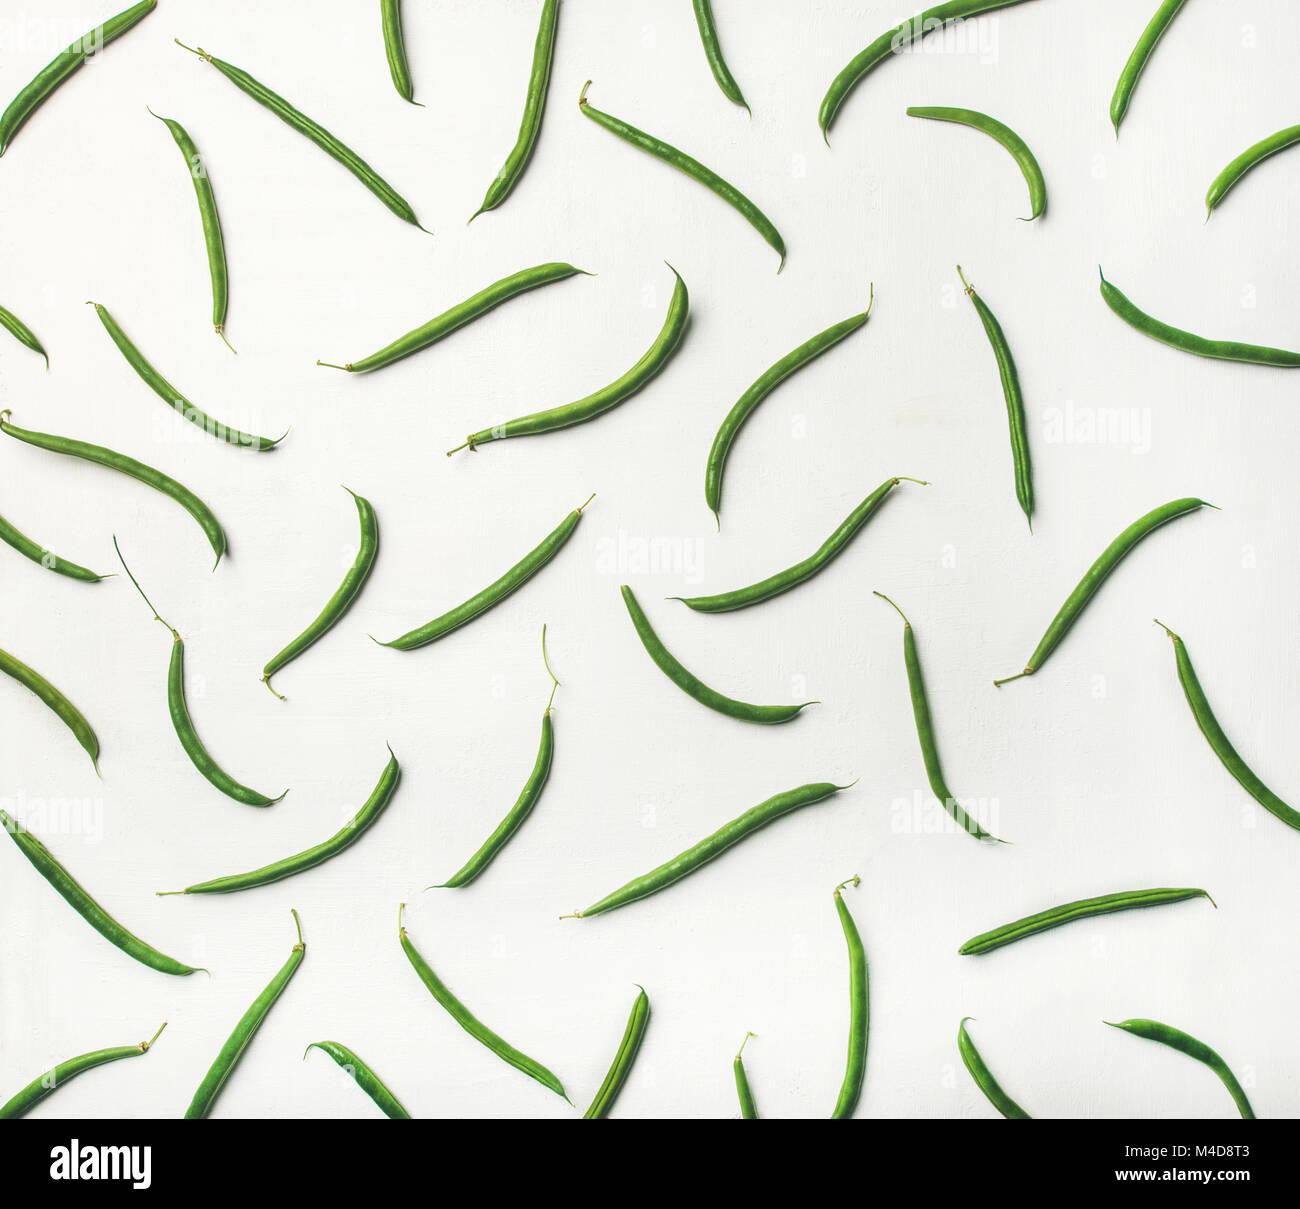 Flat-lay de frijoles verdes frescos sobre fondo blanco de madera Imagen De Stock